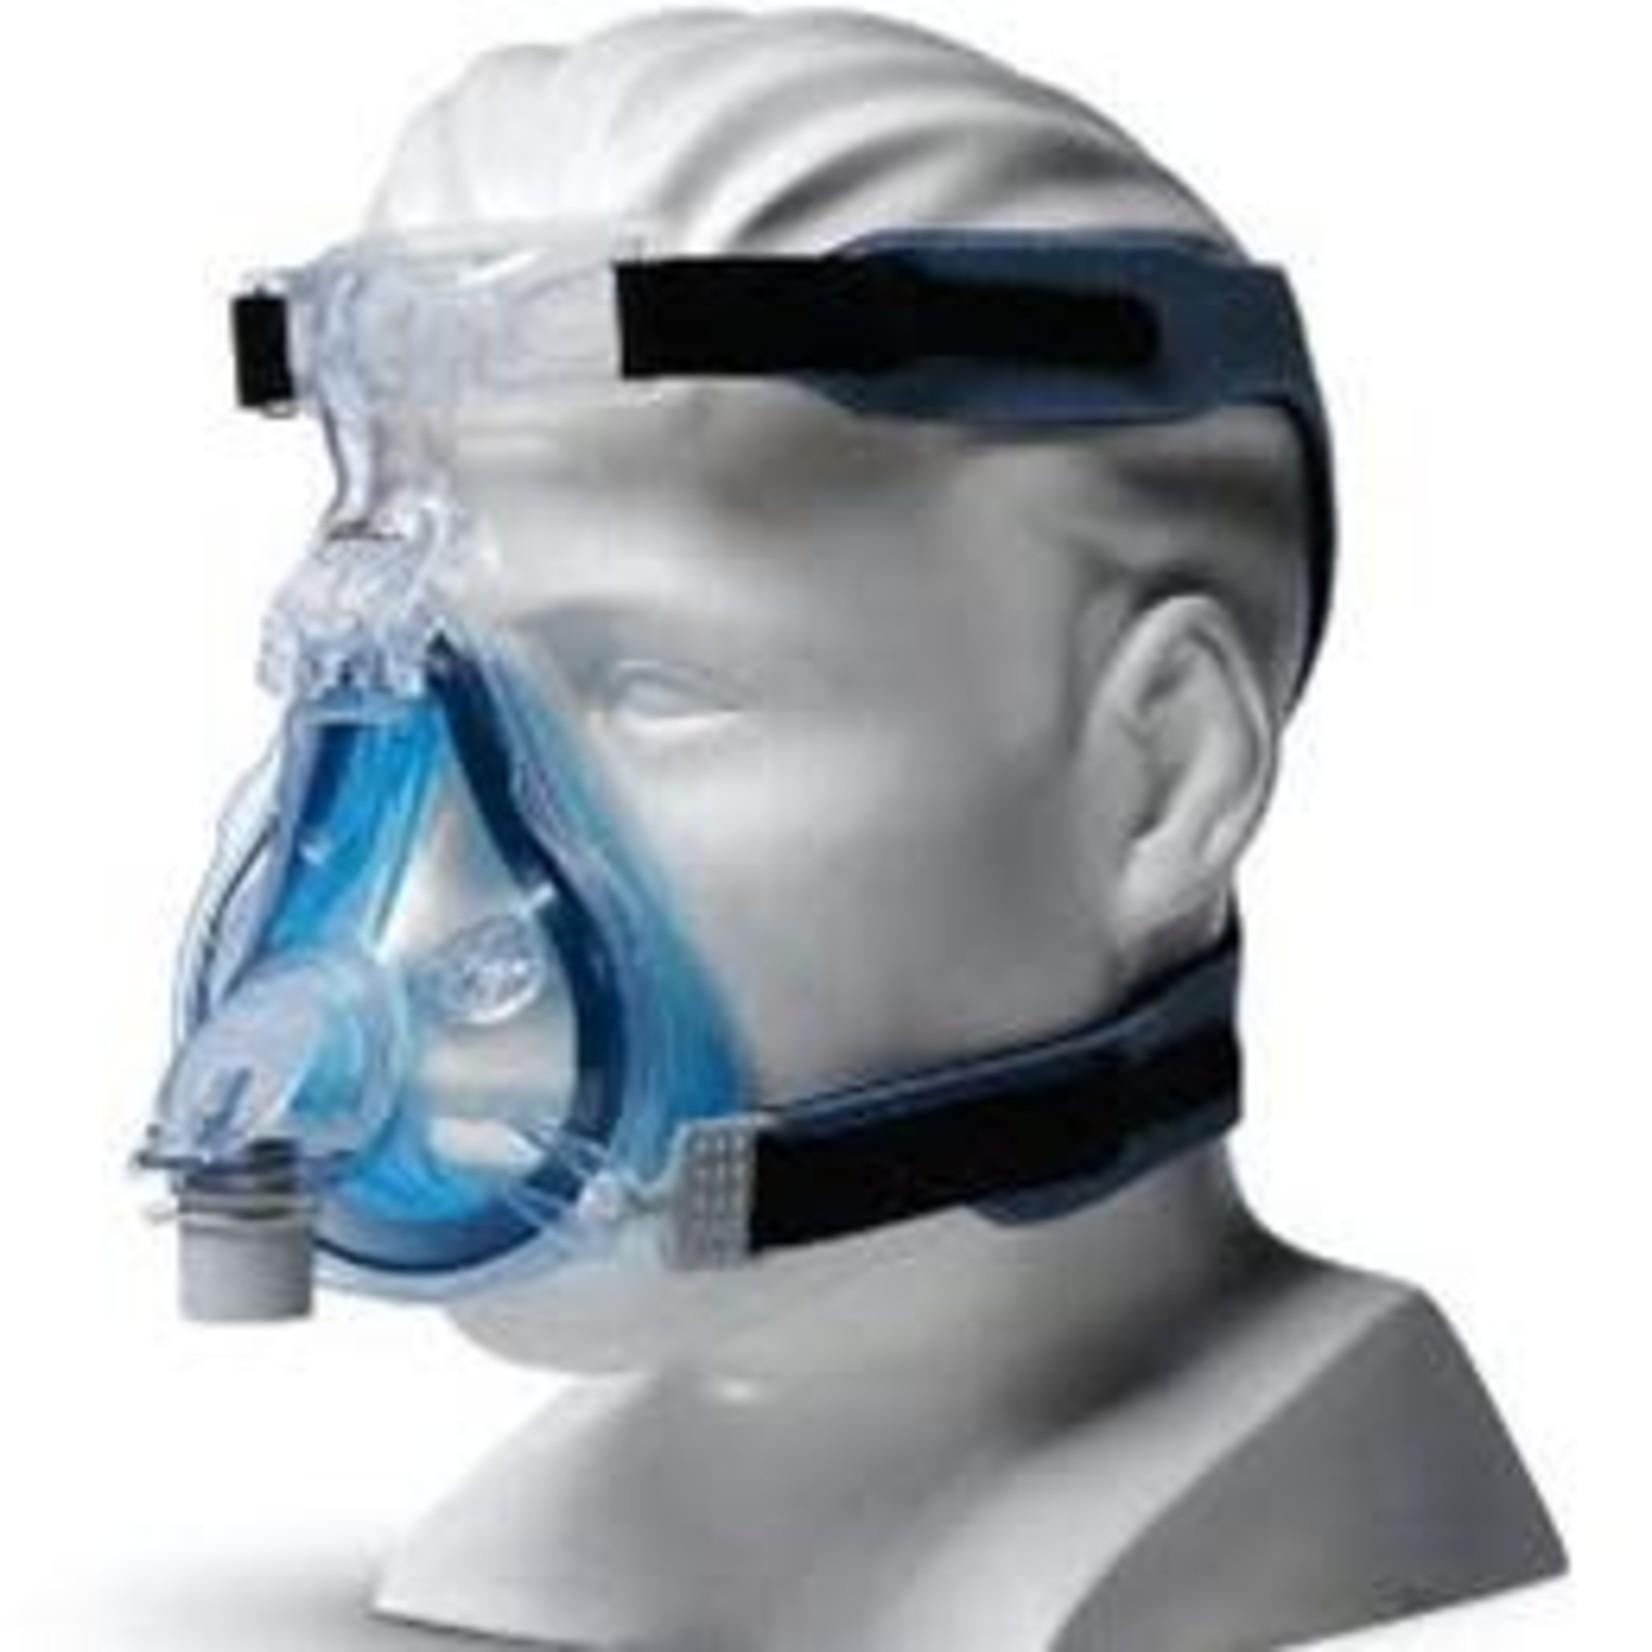 RESPIRONICS ComfortGel Nasal CPAP Mask w/ Headgear Petite